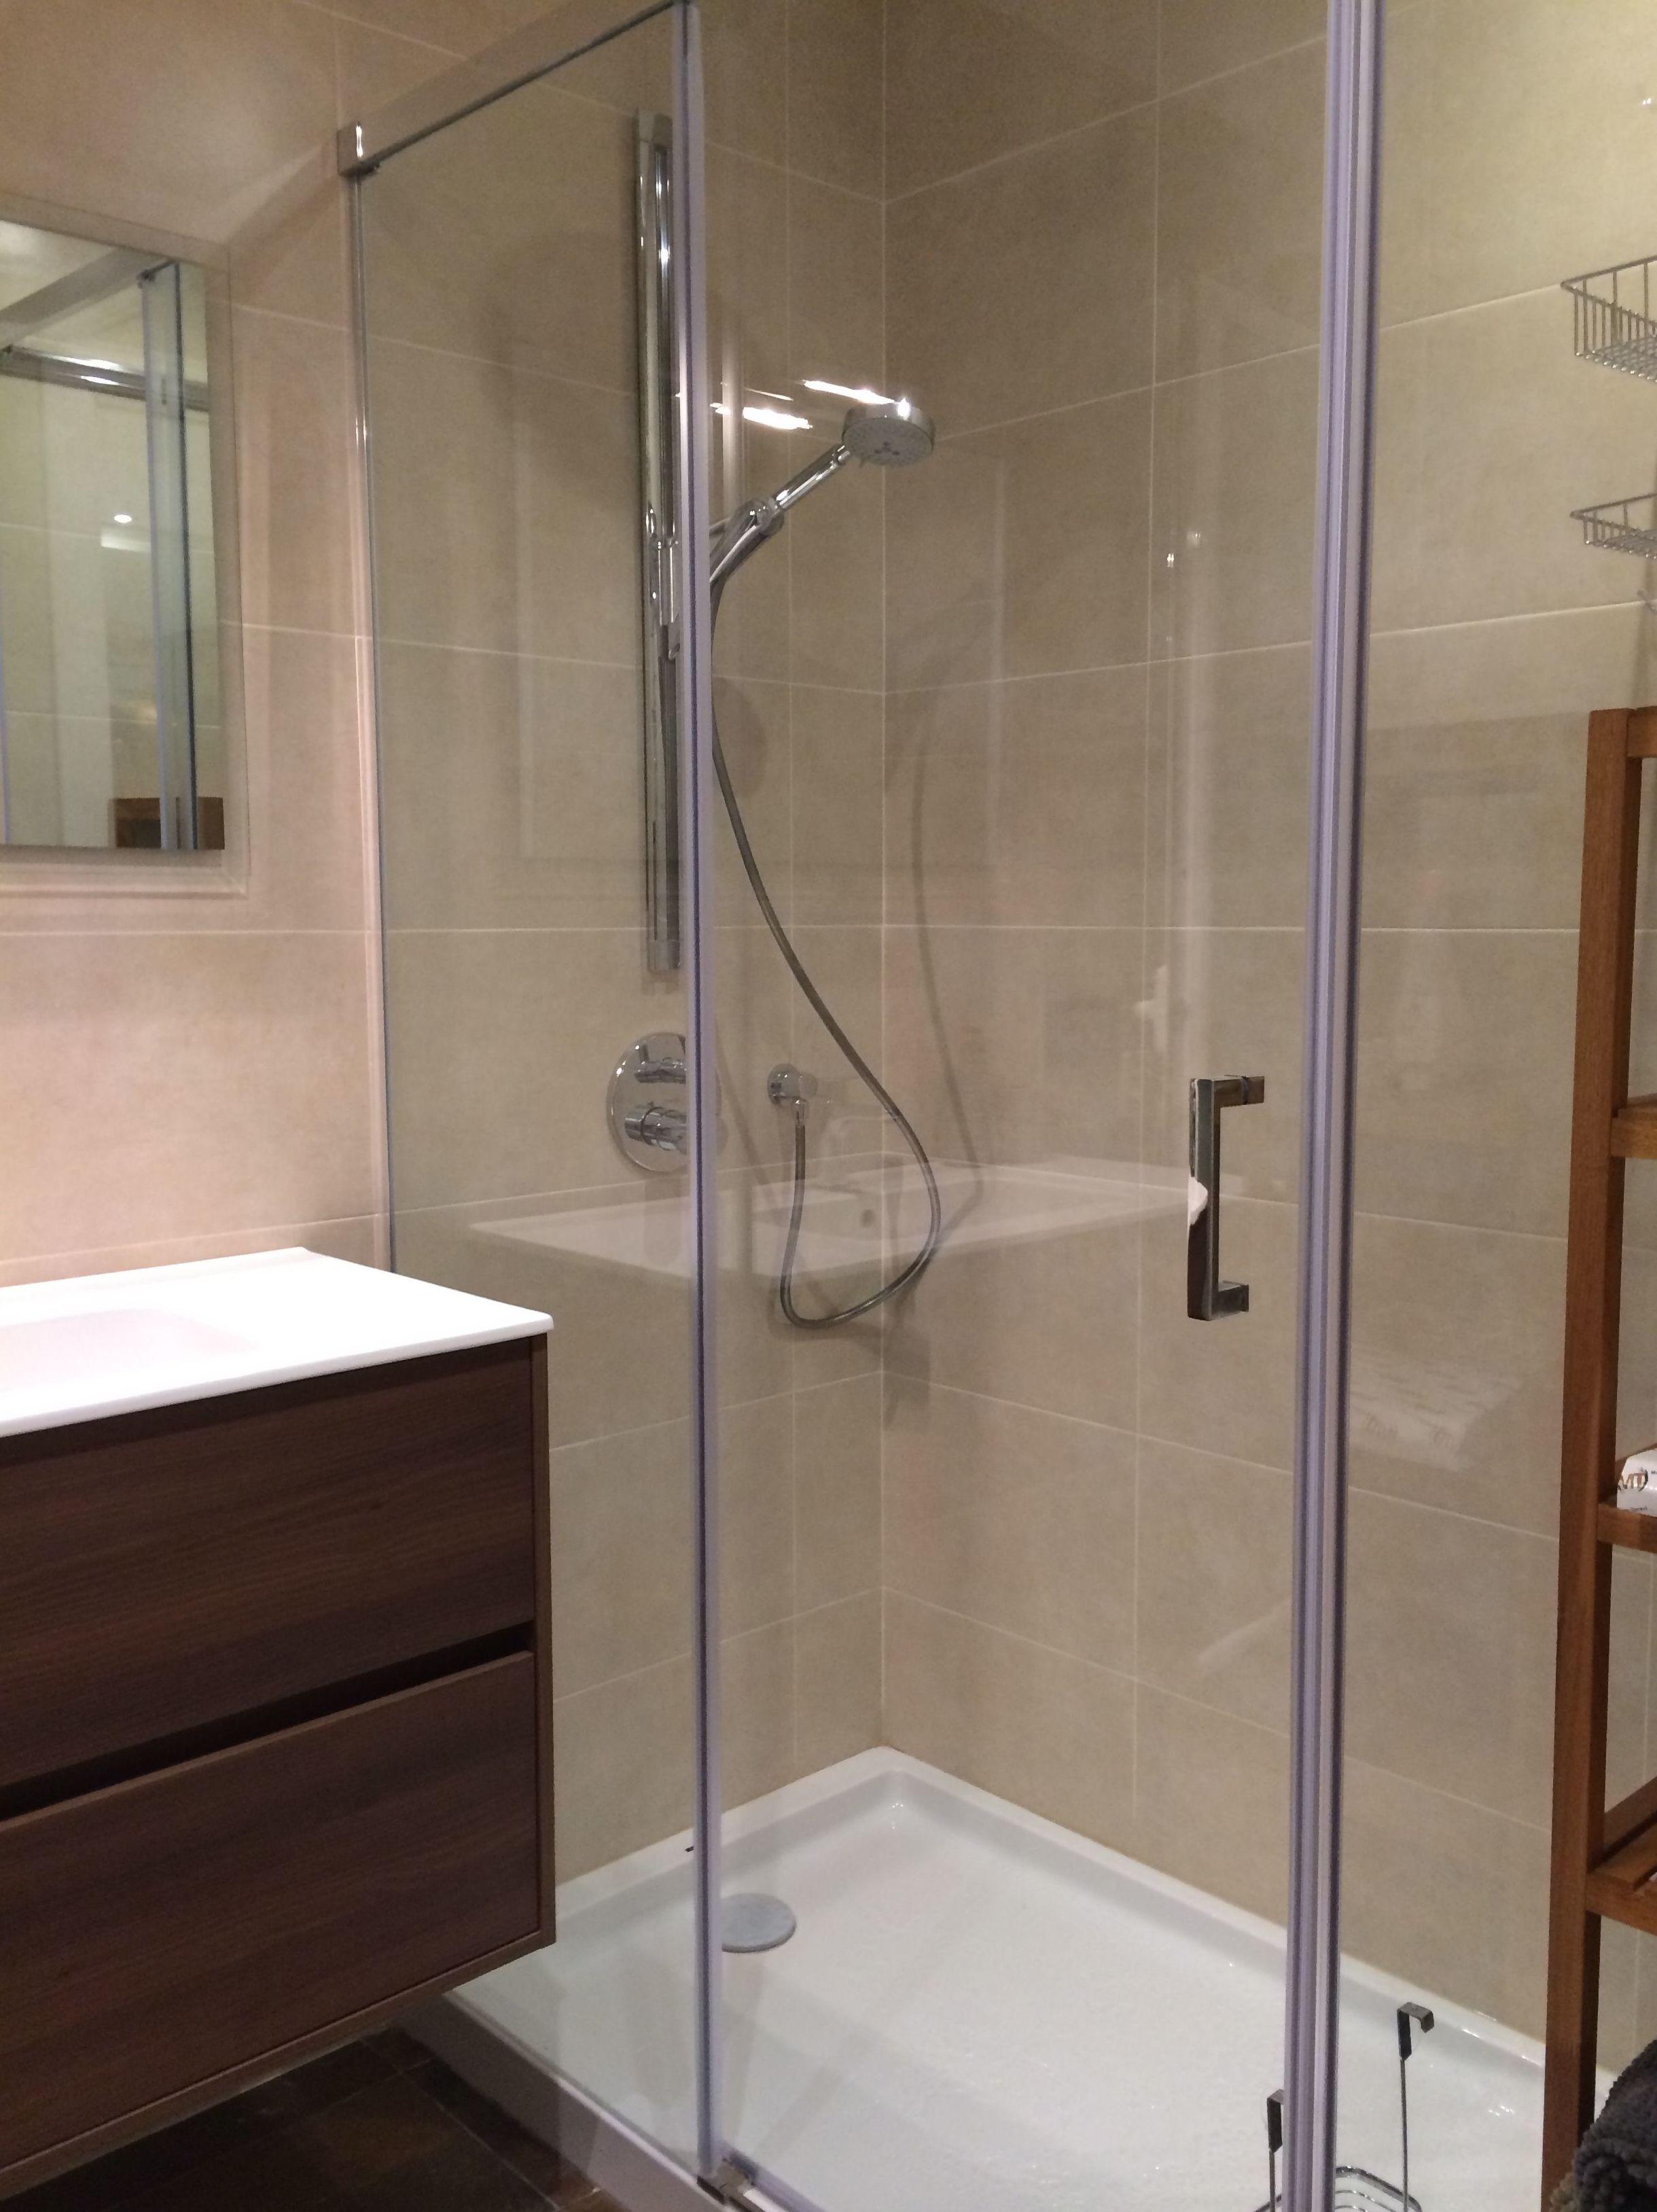 Reforma integral de calidad vivienda \u002D Baño sistema de ducha I (C/Felip II)